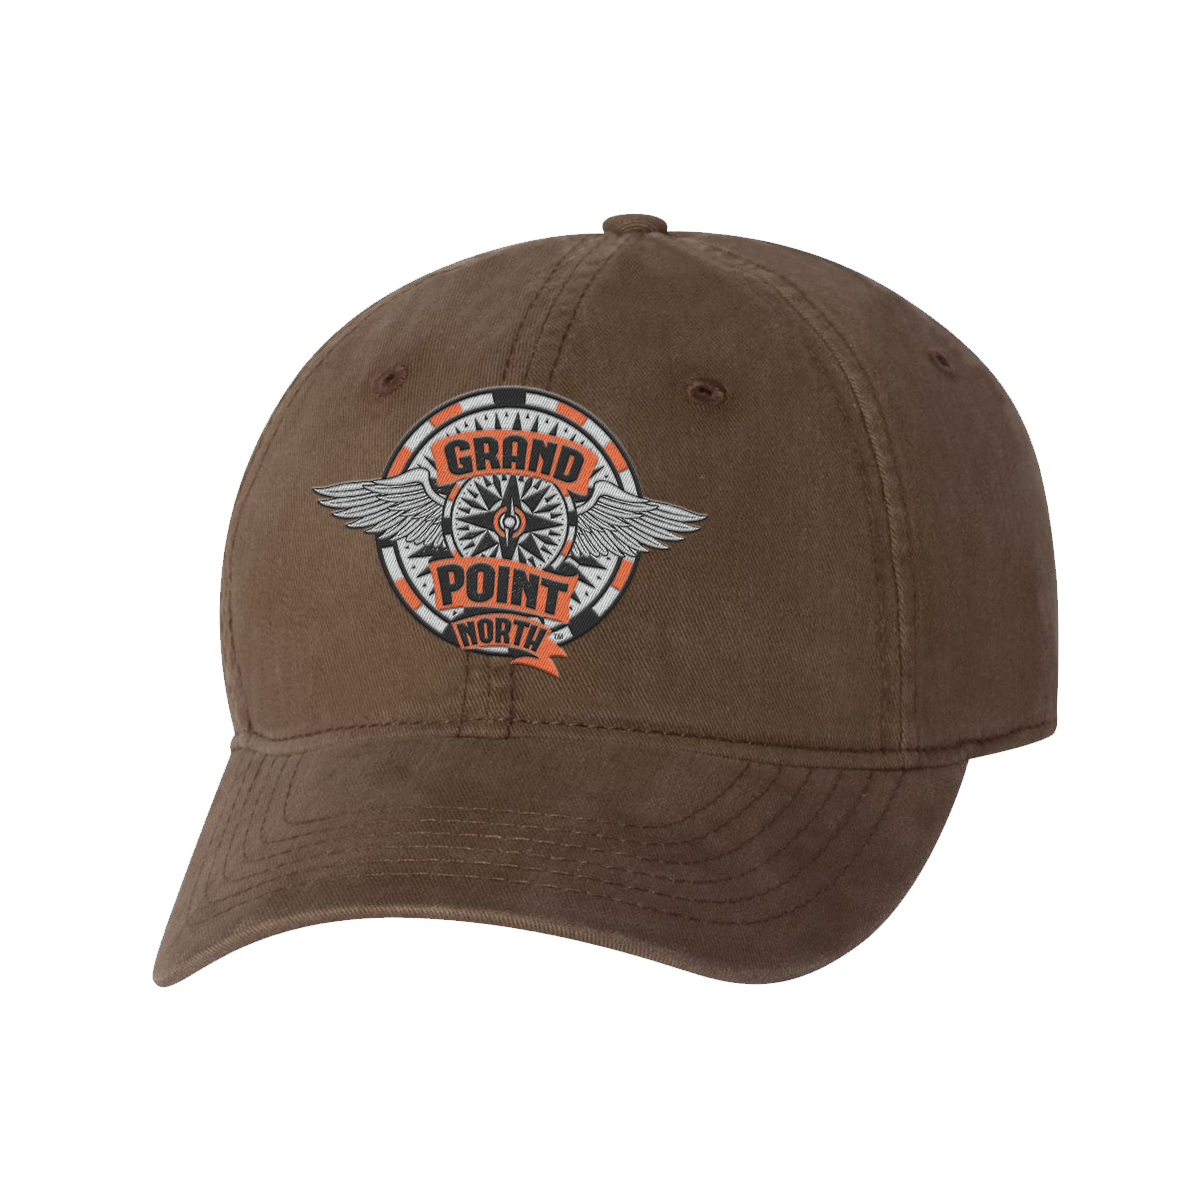 Grand Point North ® 2021 Hat